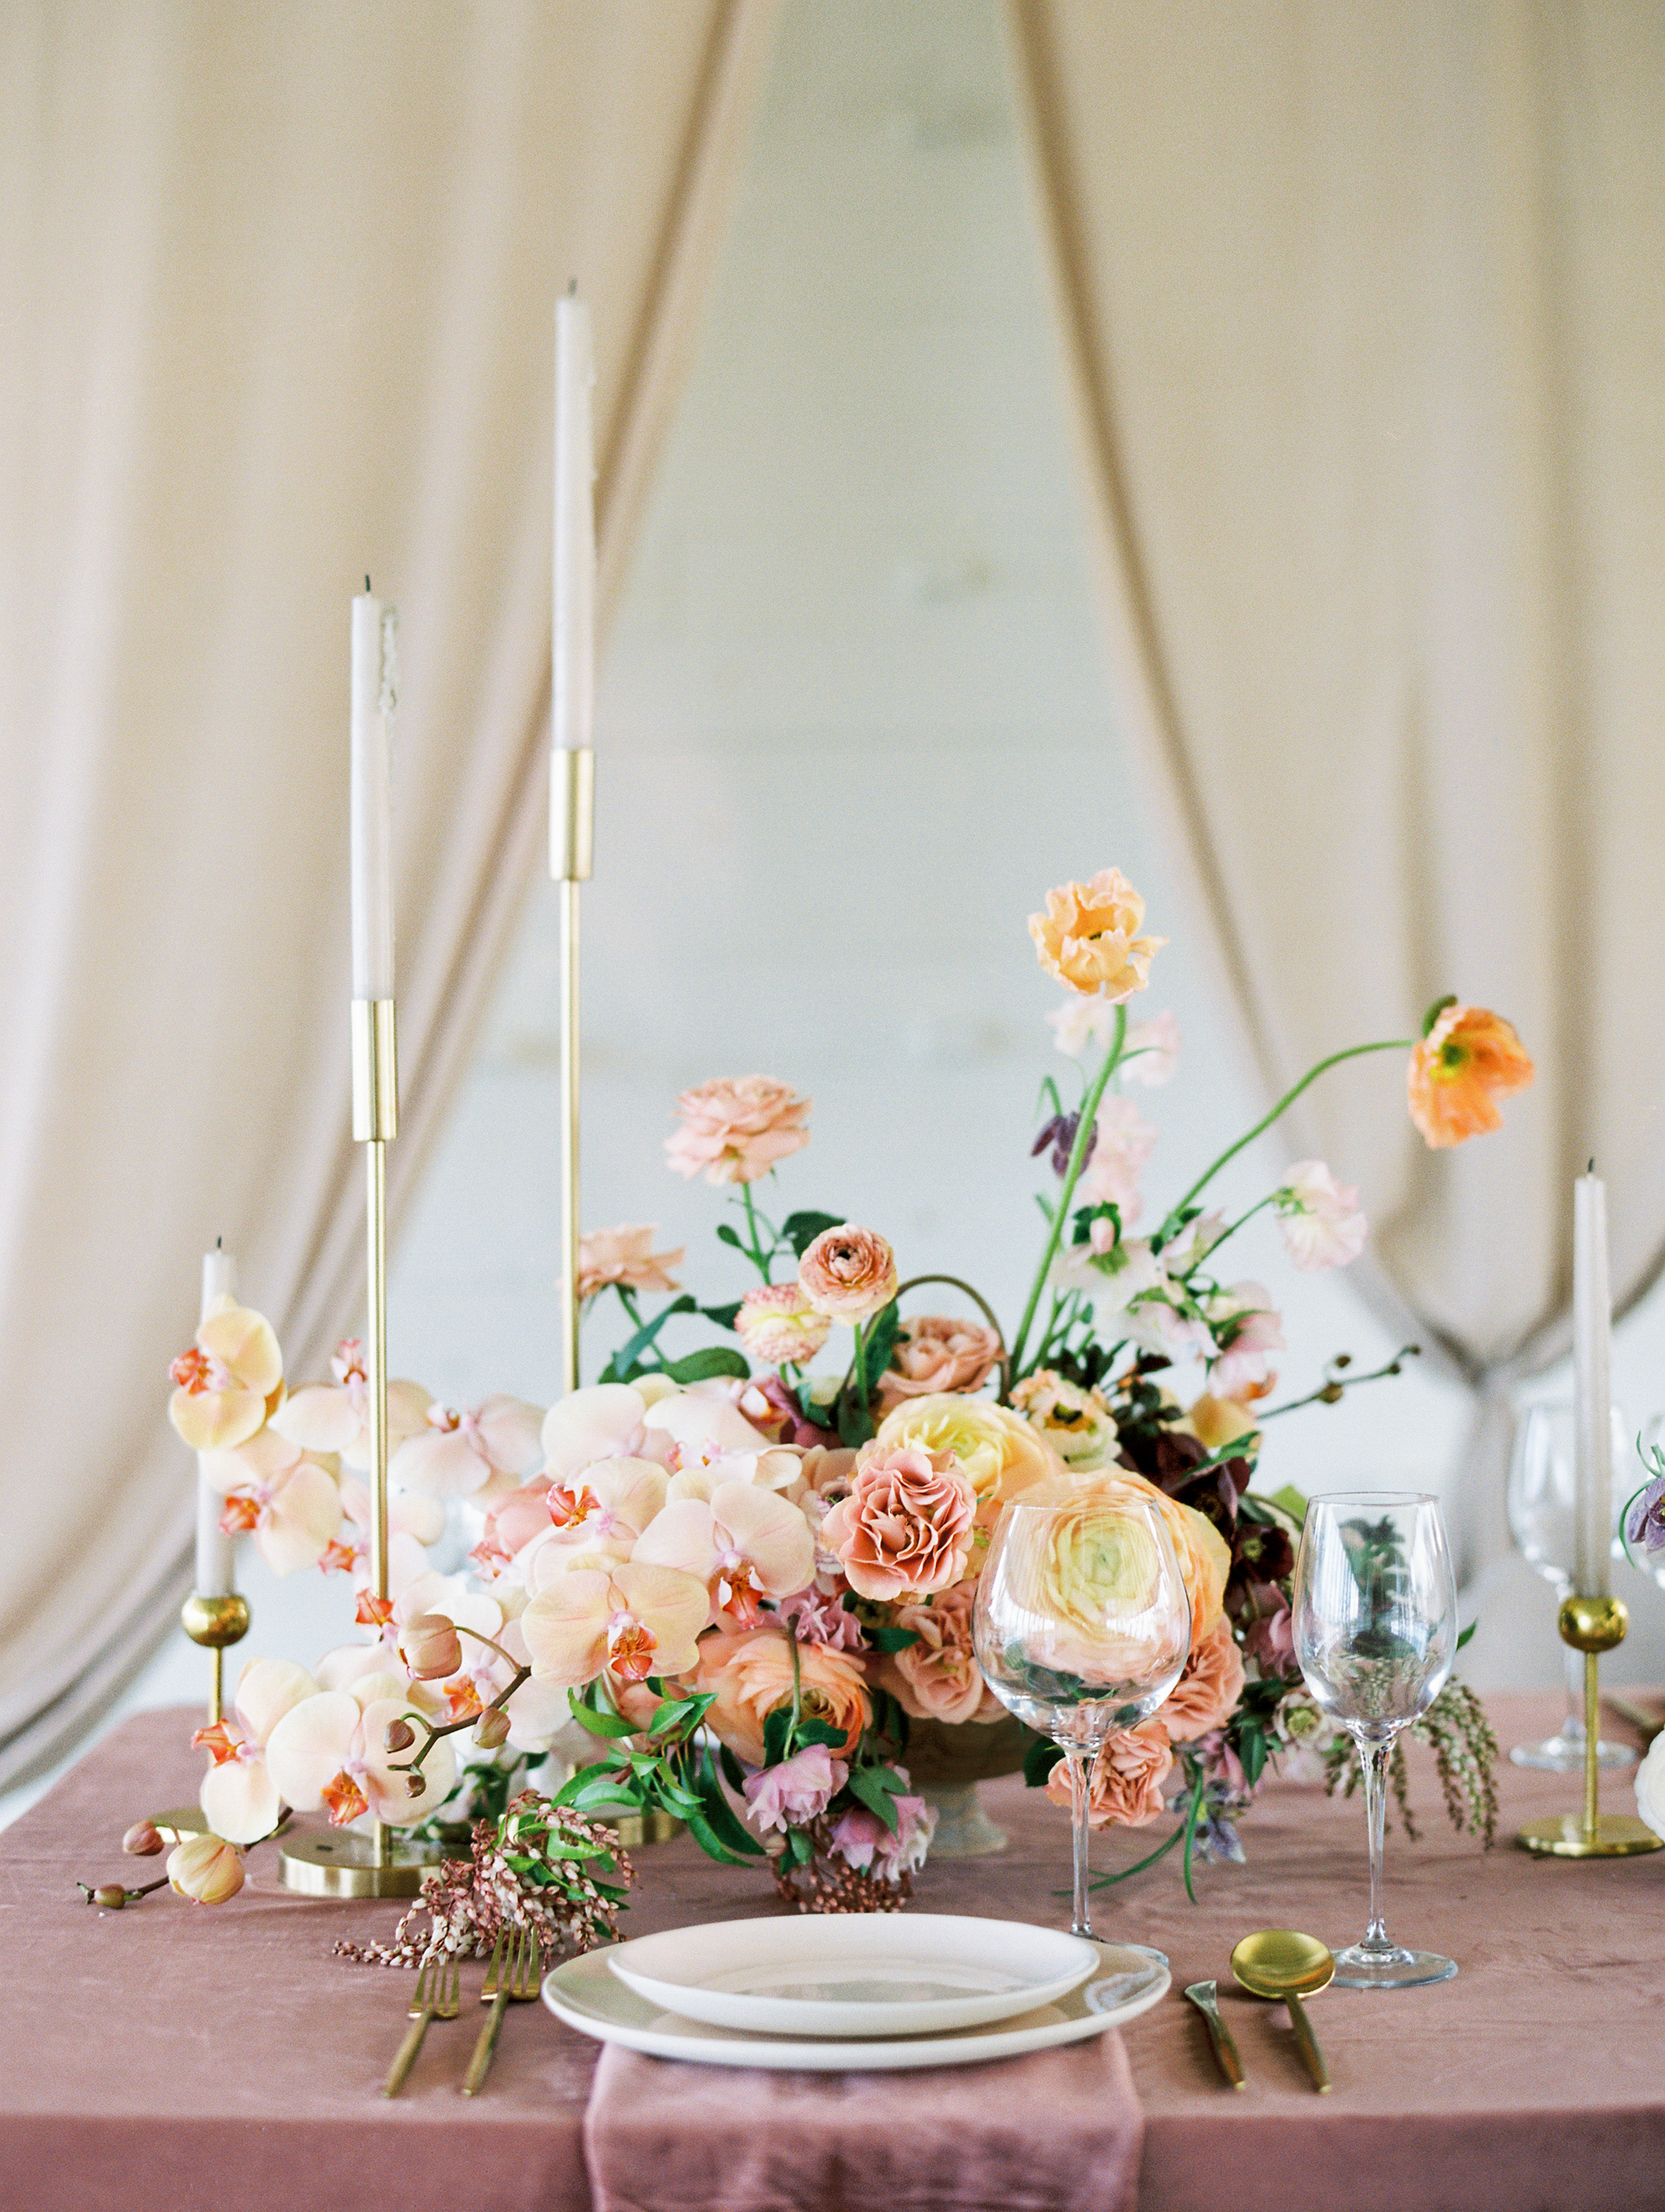 Austin-Wedding-Photography-Prospect-House-Fine-Art-Film-Destination-Dana-Josh-Fernandez-Photography-Dallas-Houston-Luxury-Best-Top-14.jpg